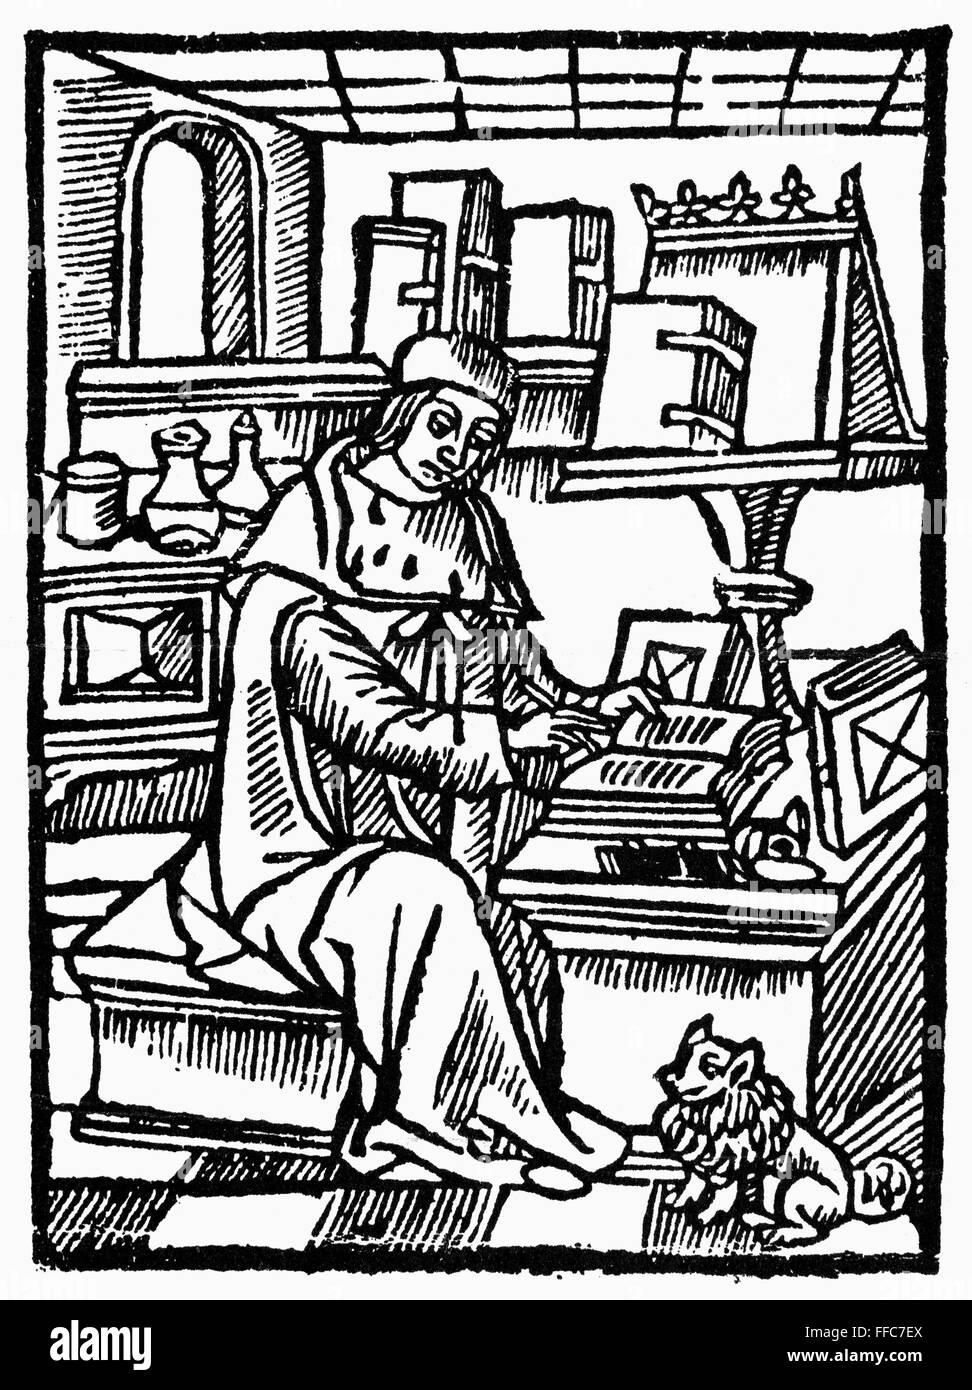 Medieval Writer Na Medieval Writer Possibliy A Scribe